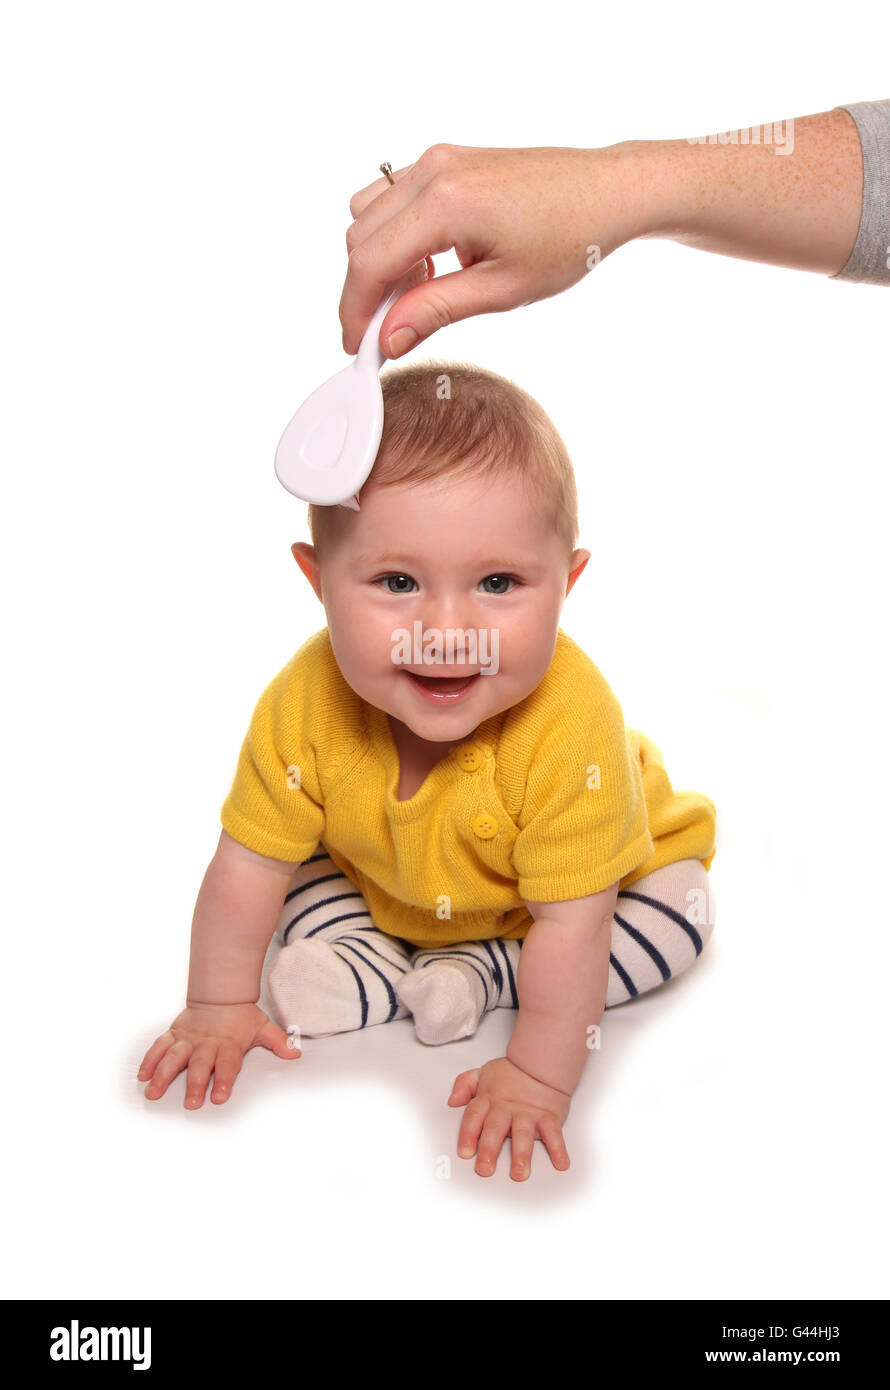 Mum combing baby girls hair cutout - Stock Image